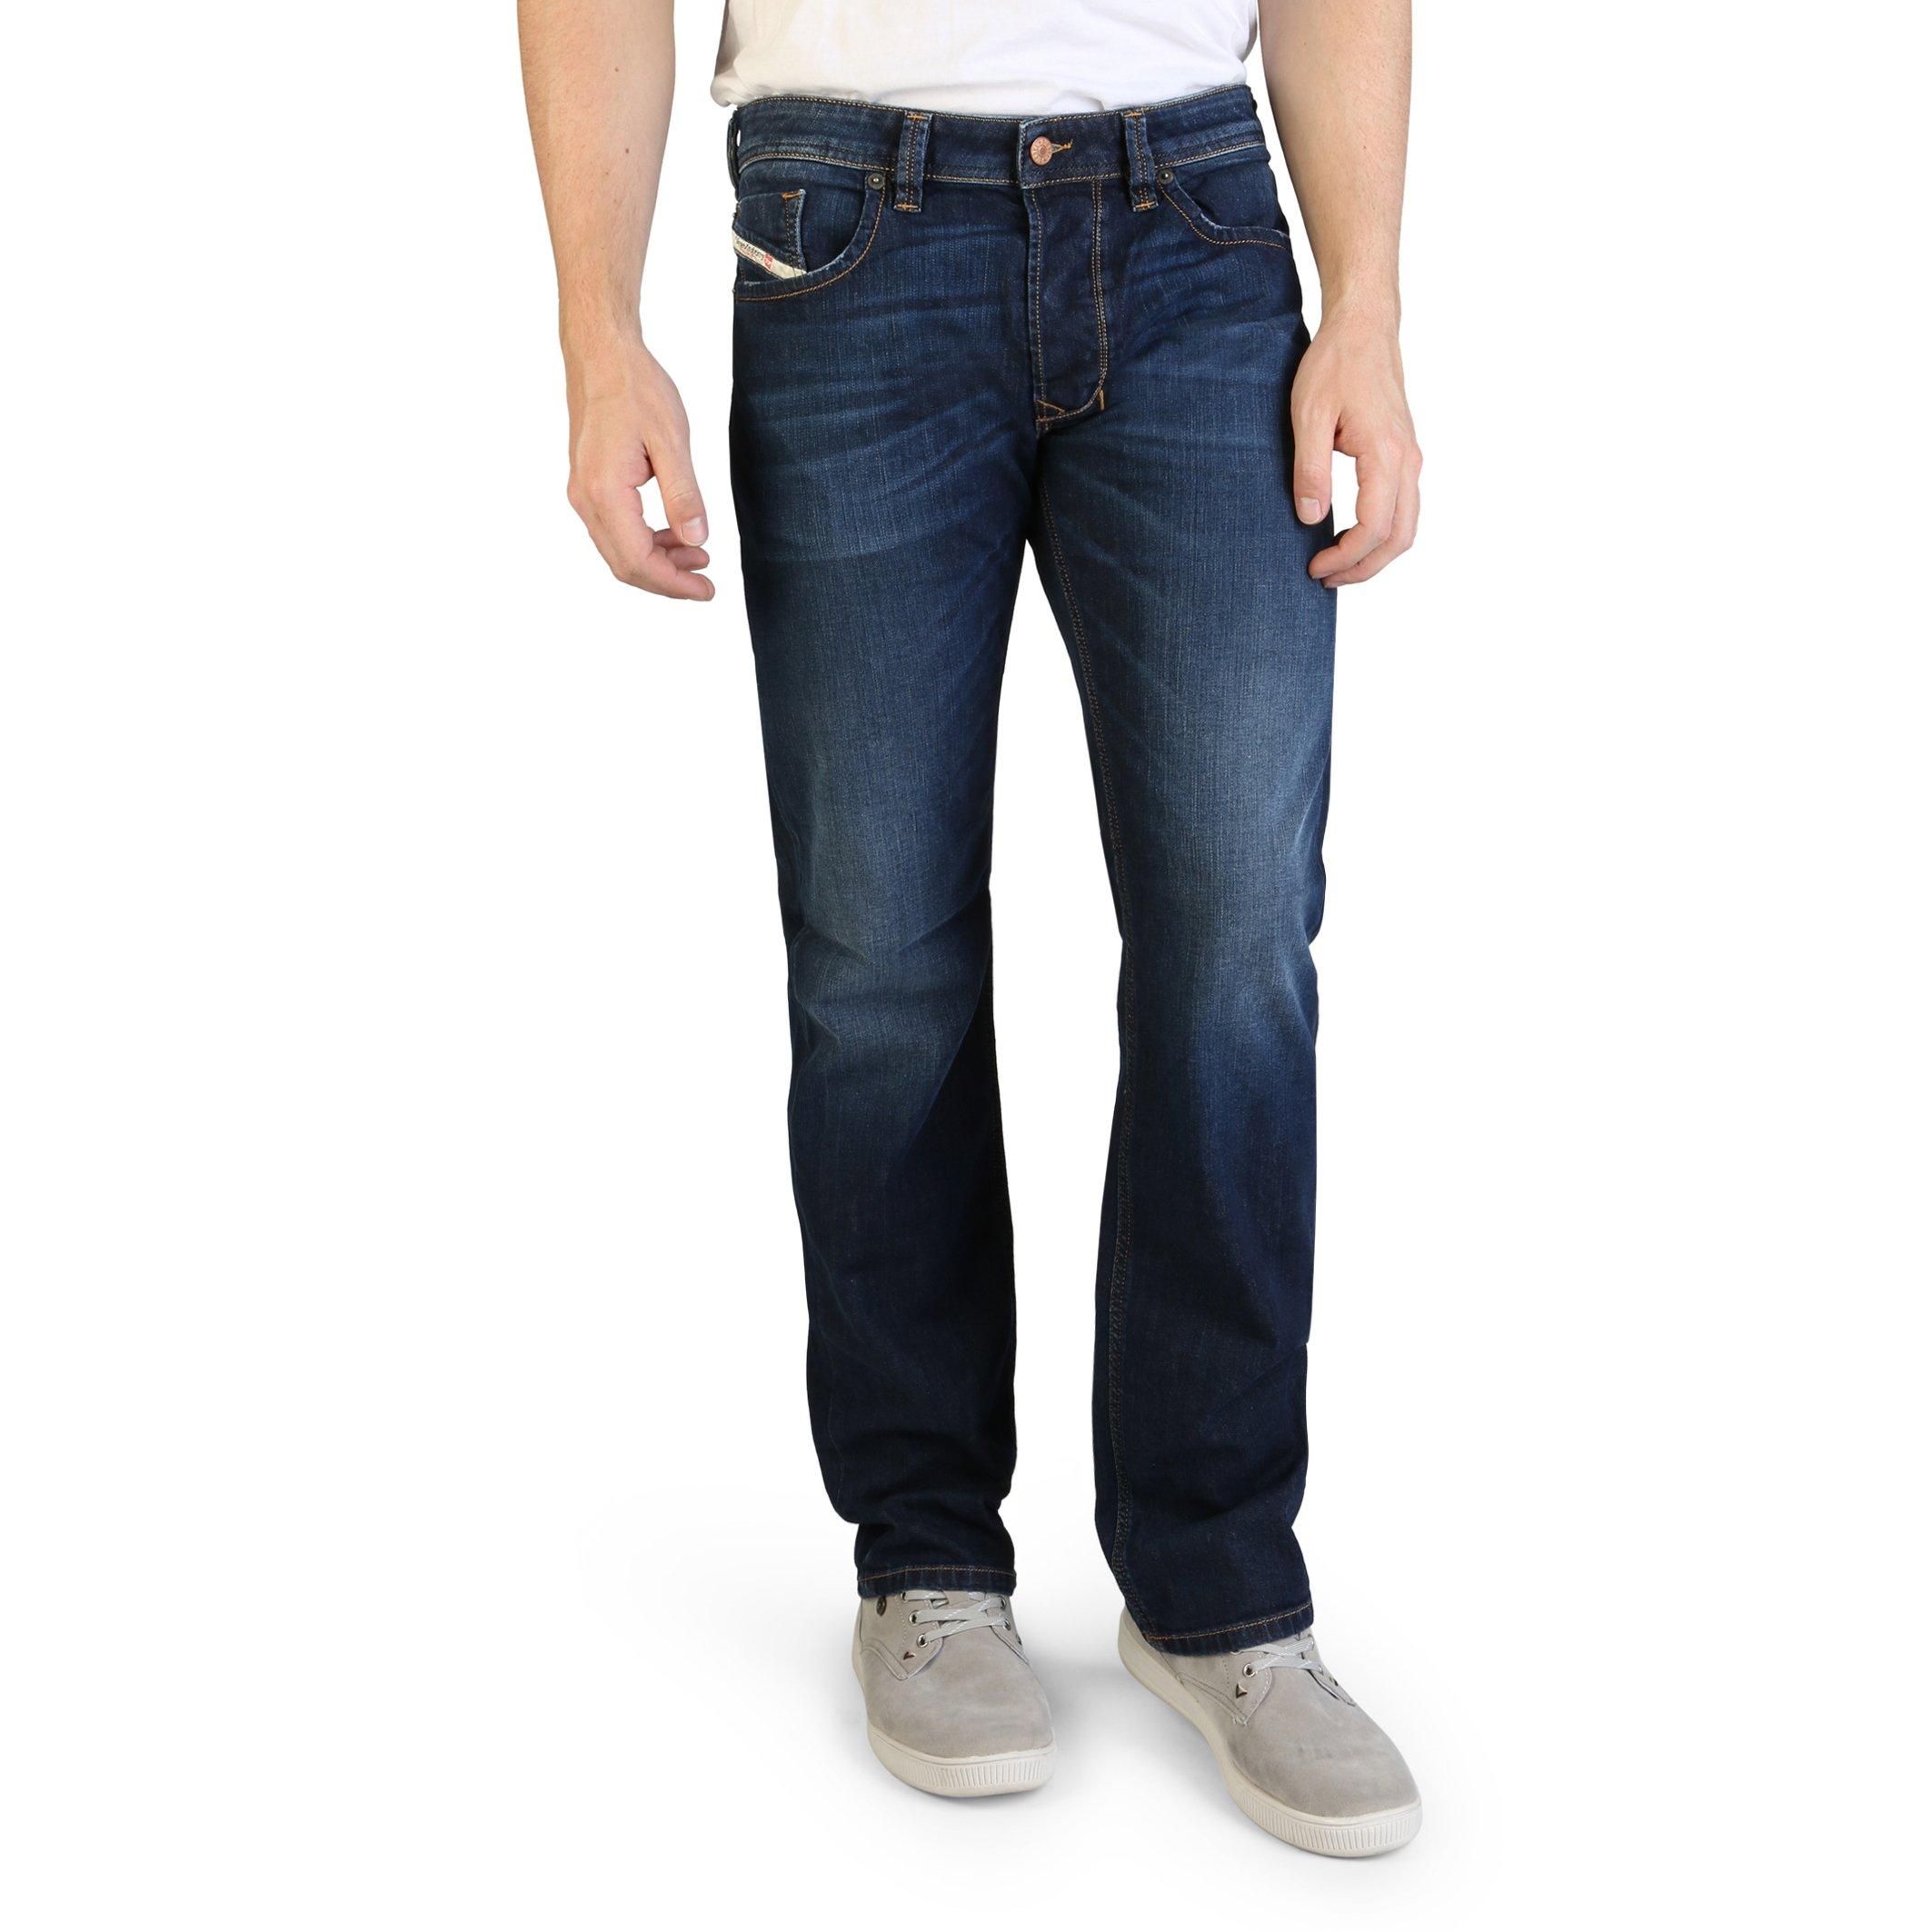 Diesel Men's Jeans Blue LARKEE_L32 - blue-4 29